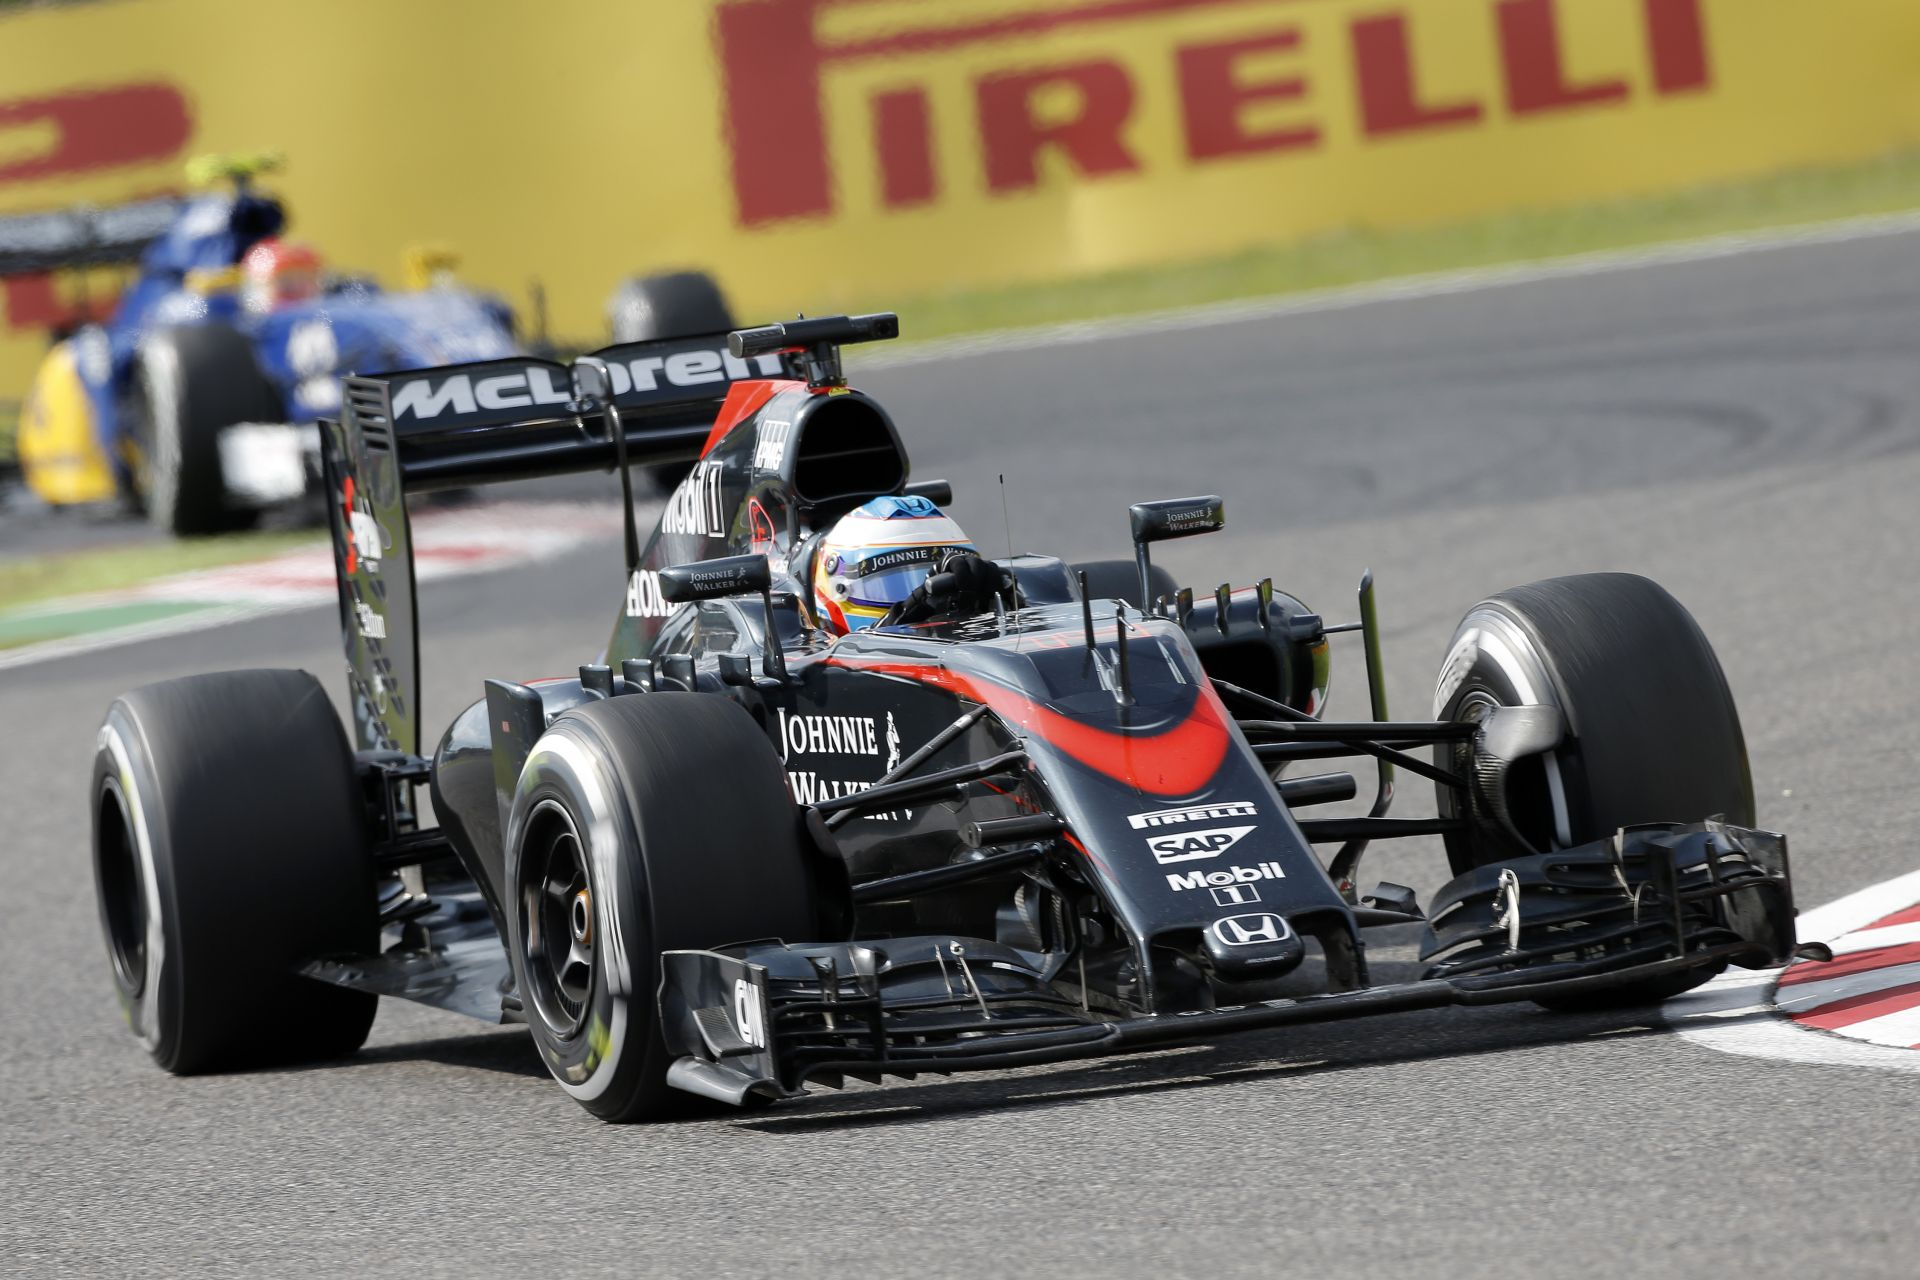 Alonso Q2-es köre a McLaren-Hondával Suzukában